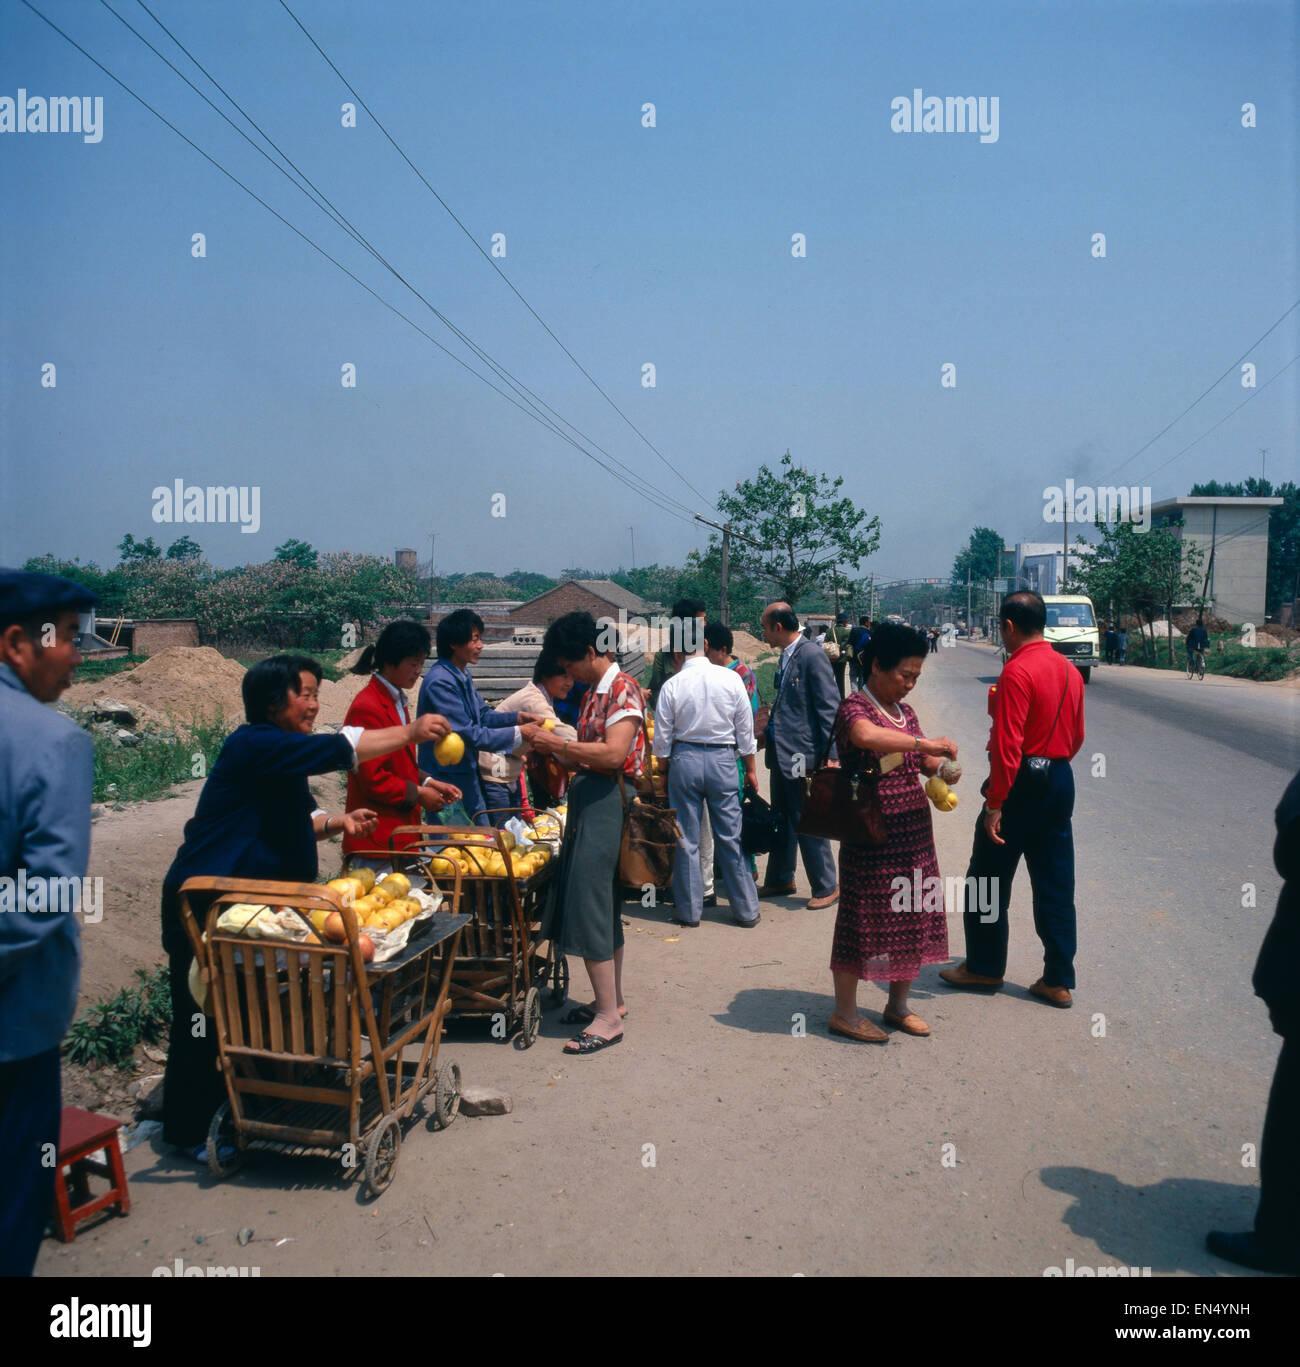 Eine Reise nach China, 1980er Jahre. A trip to China, 1980s. - Stock Image